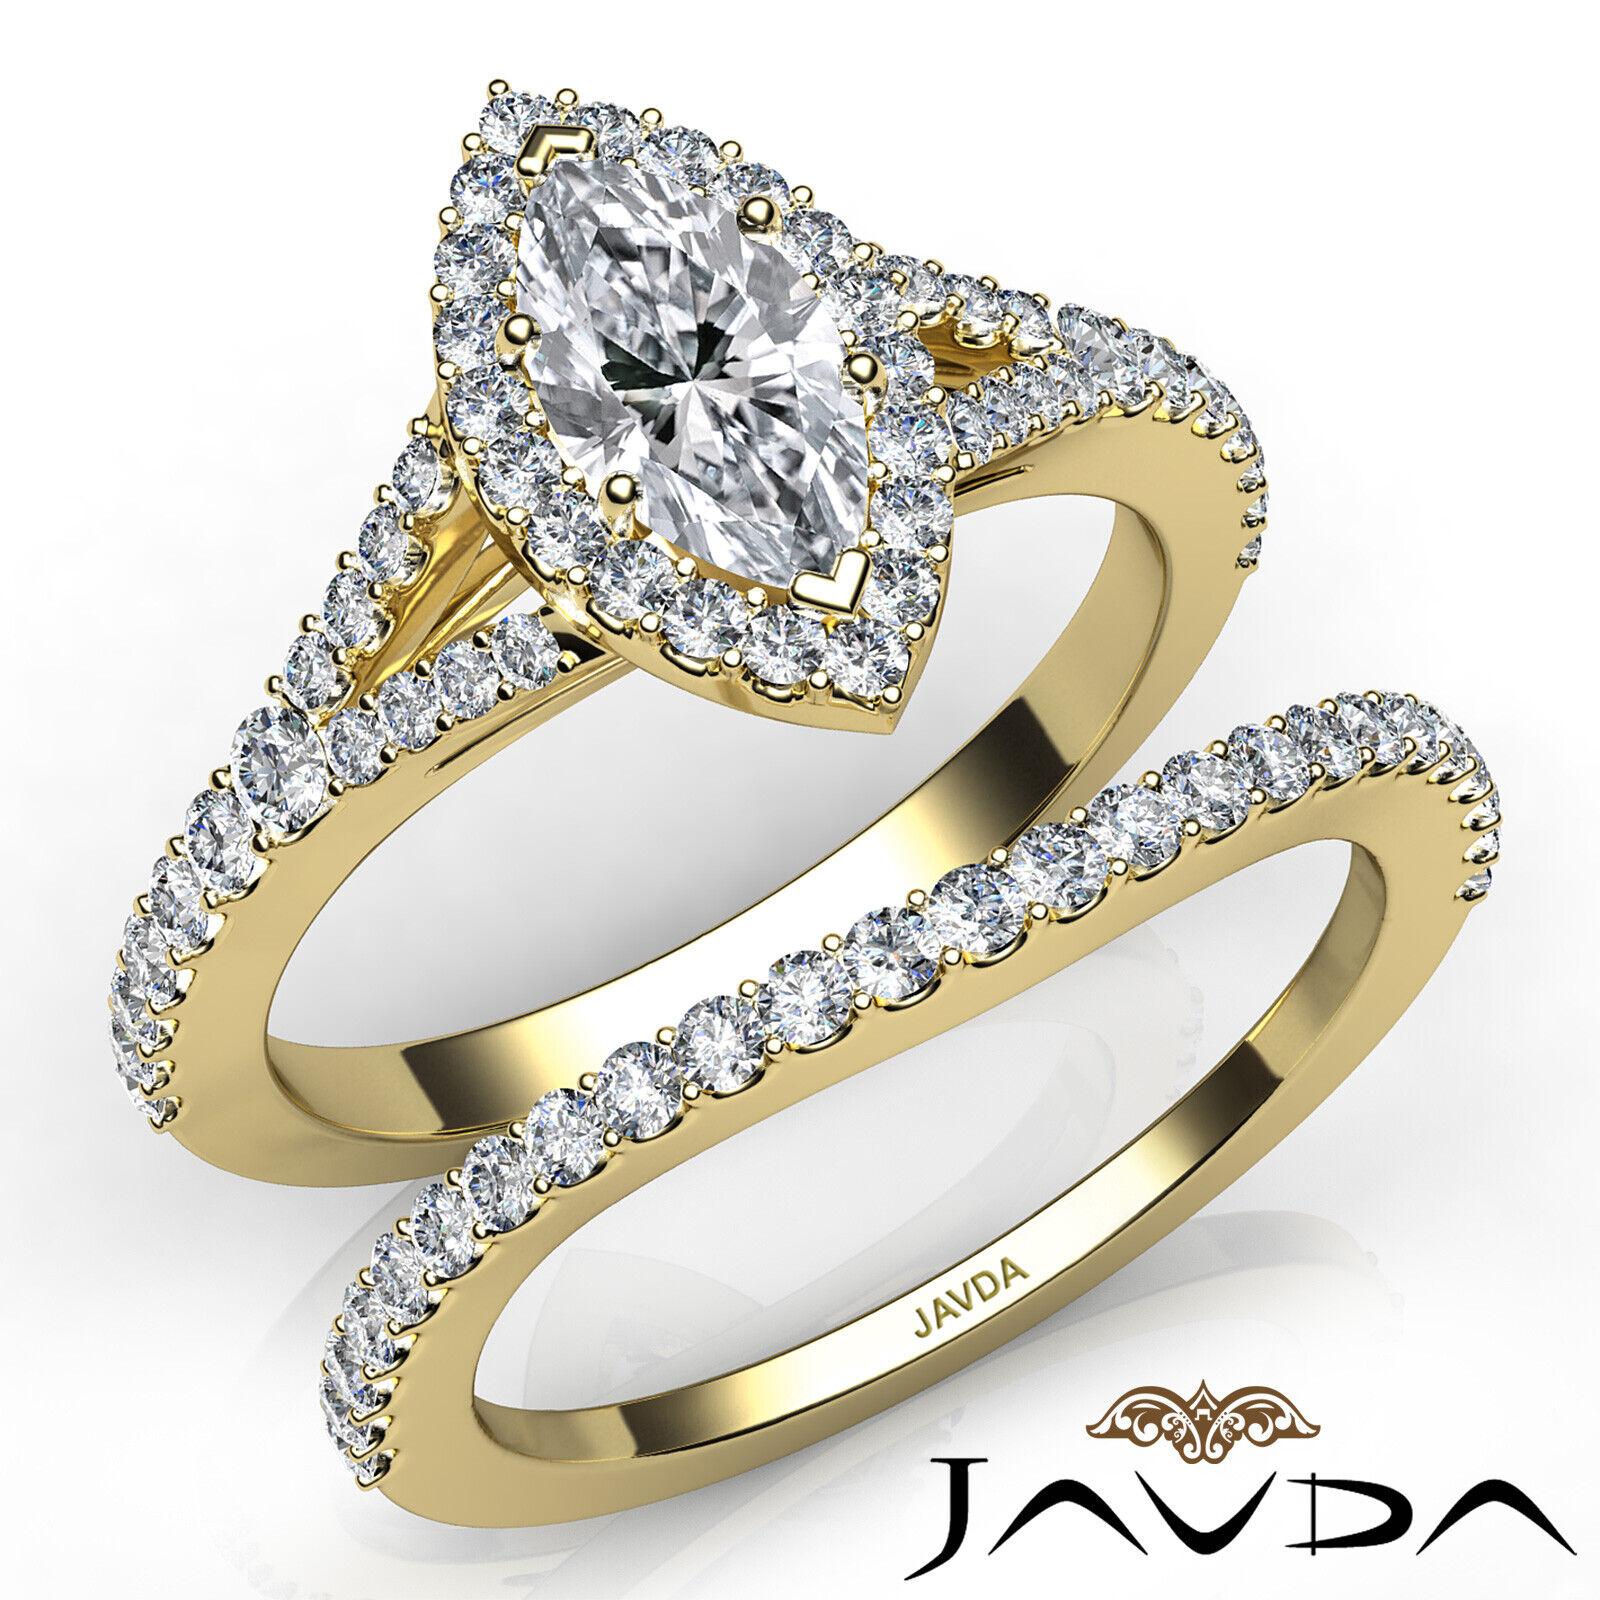 2.02ctw Halo Bridal Set Split Shank Marquise Diamond Engagement Ring GIA F-SI1 8